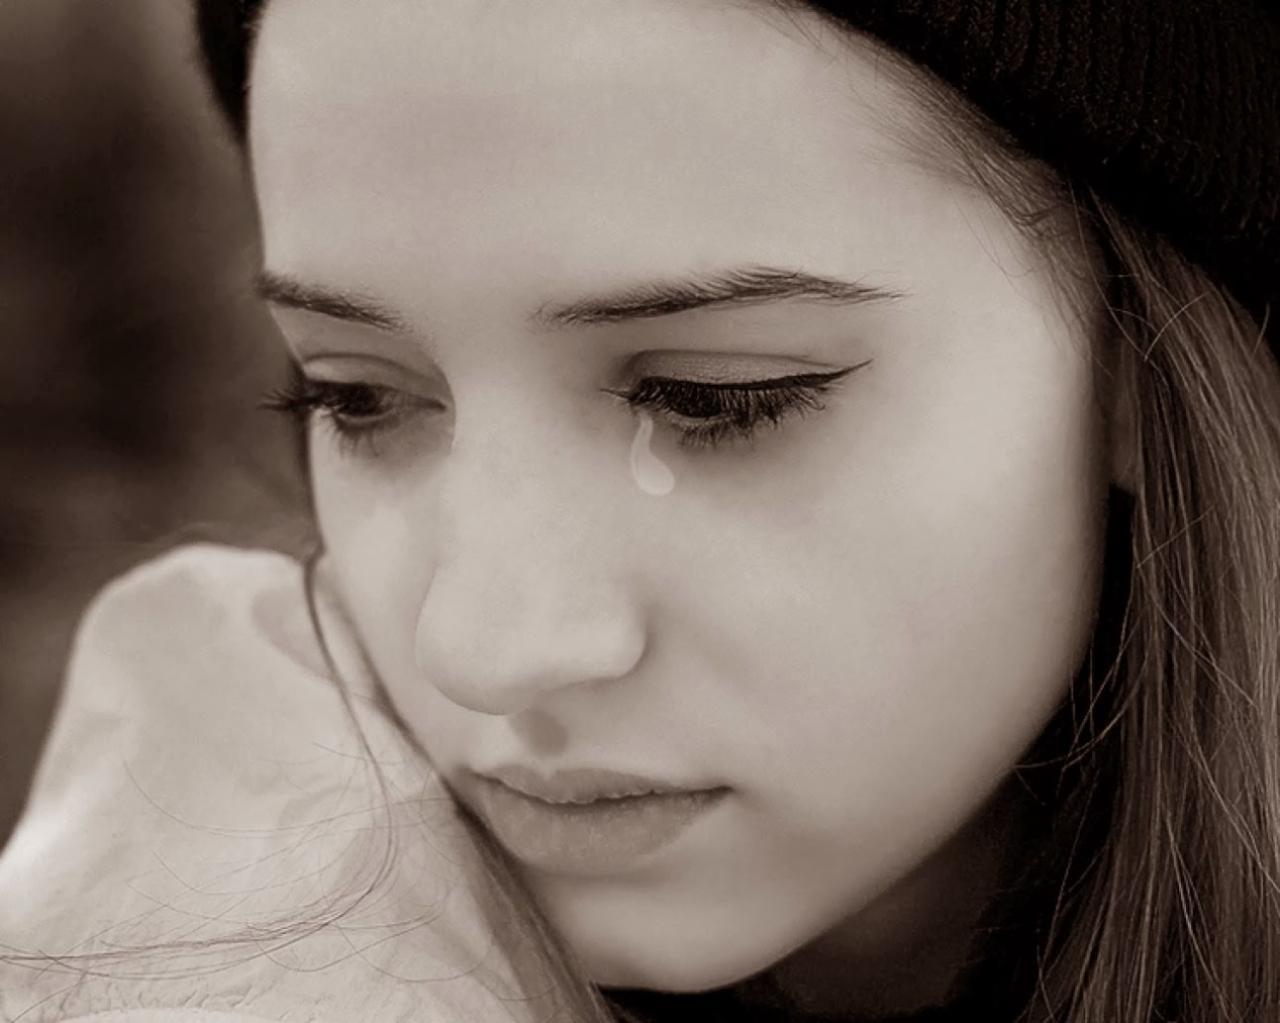 بالصور صور دموع حزينة , صور متنوعه حزن وبكاء 2245 28